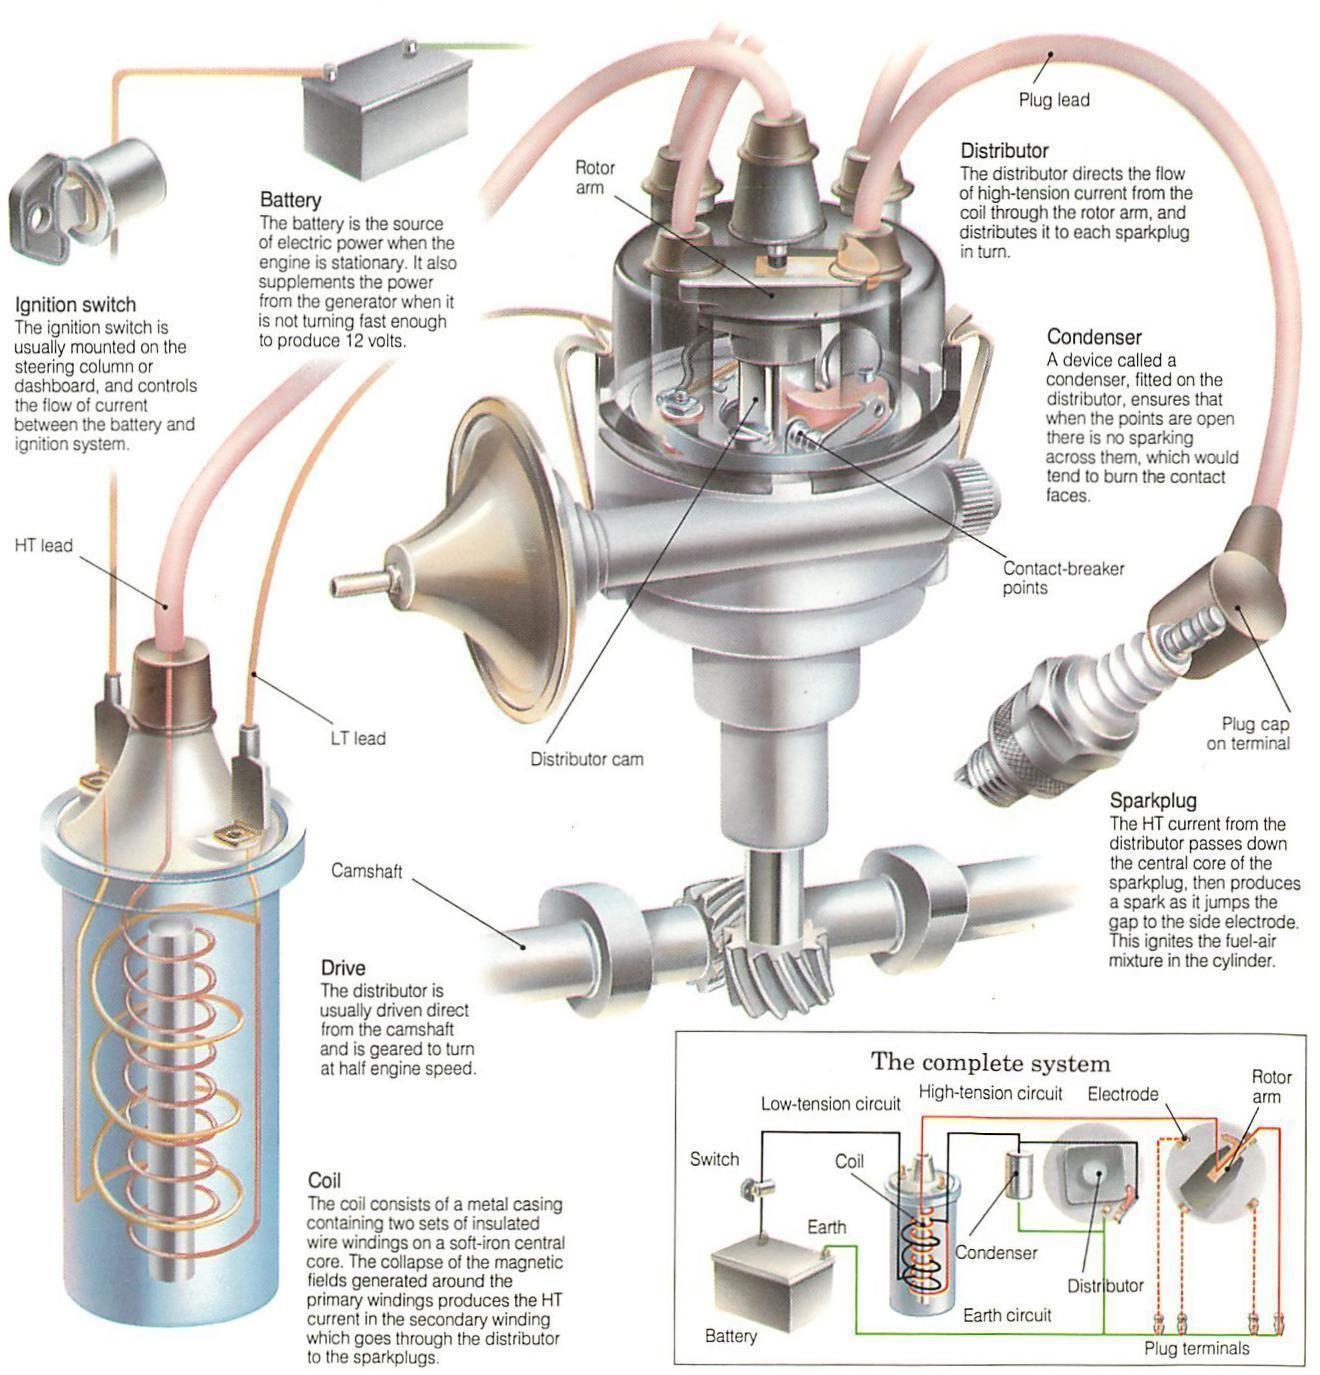 how the ignition system works 1320 1375. Black Bedroom Furniture Sets. Home Design Ideas